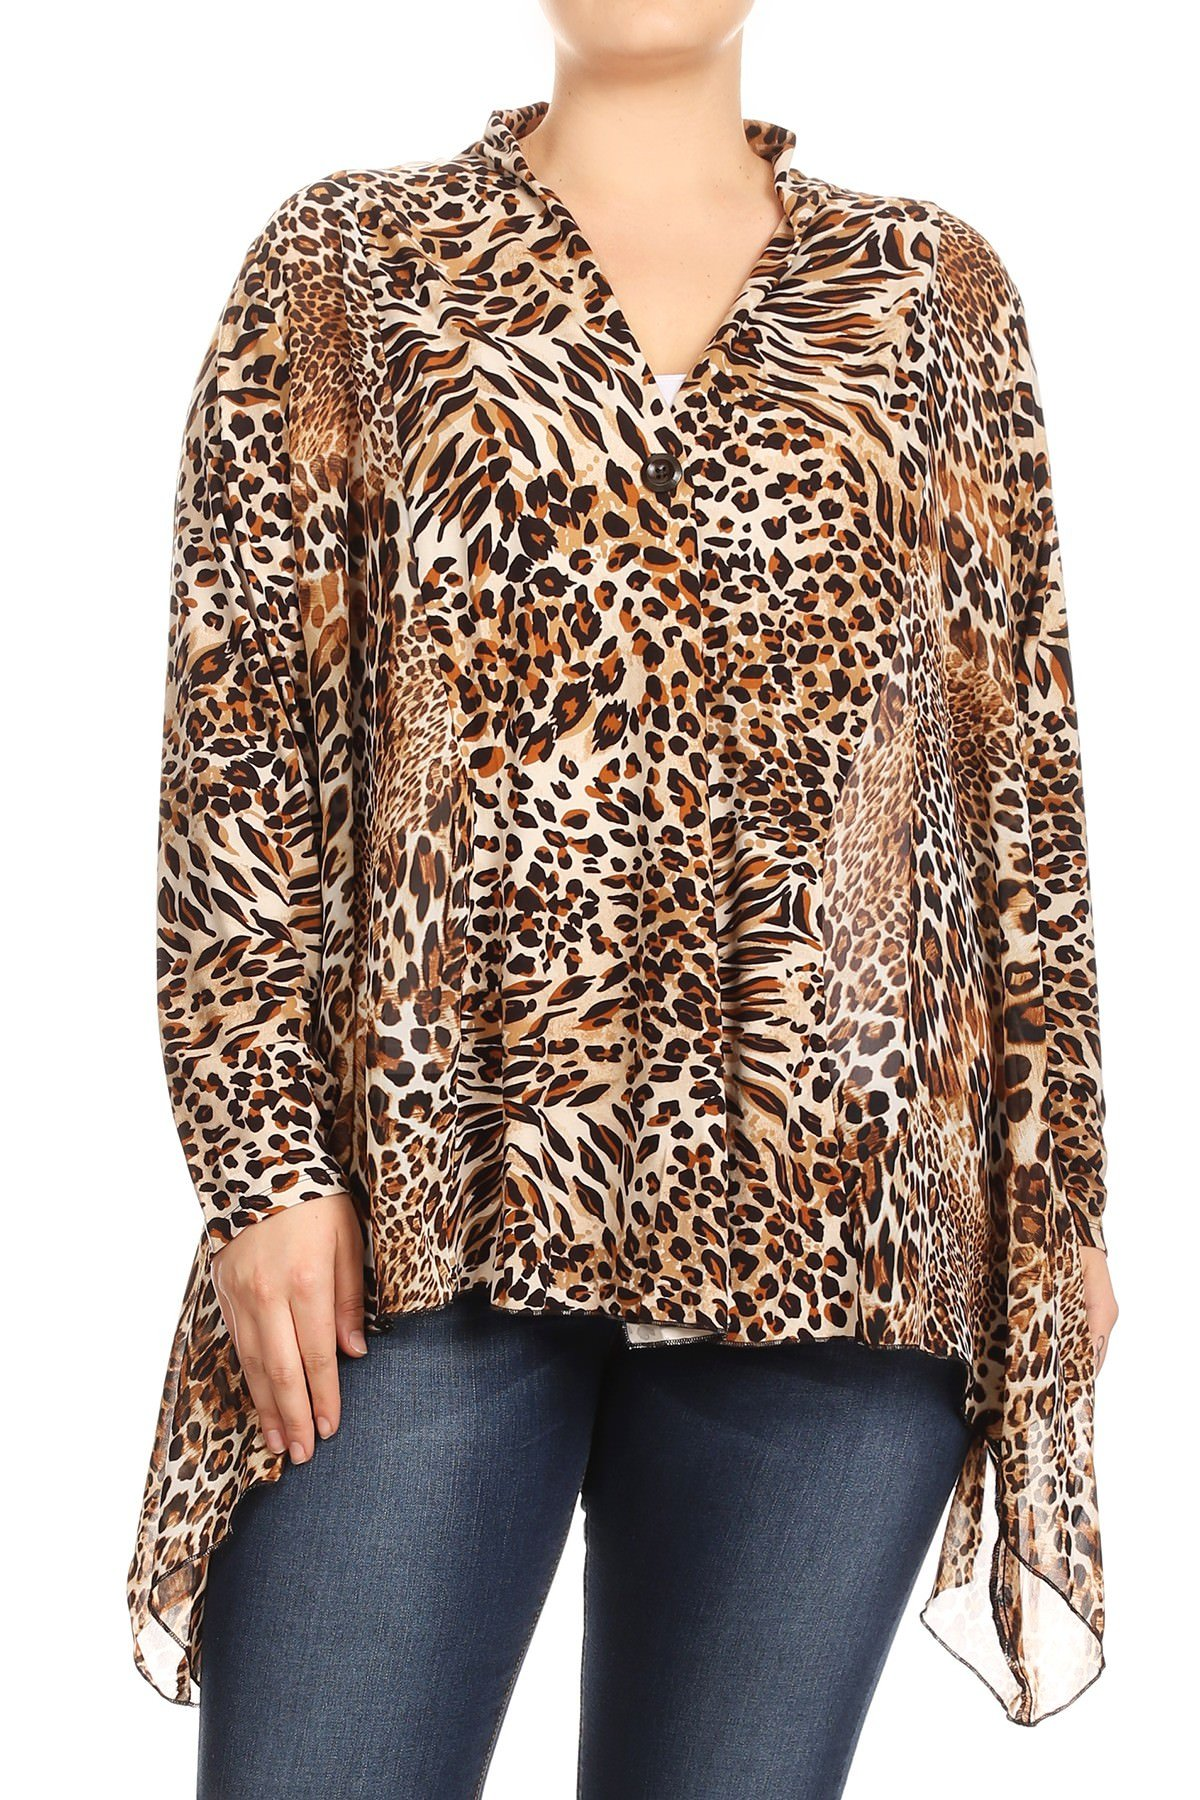 Aki Shop Women Plus Size Leopard Print Long Sleeve Loose Fit Cardigan Vest Top Coffee 2XL SE17041